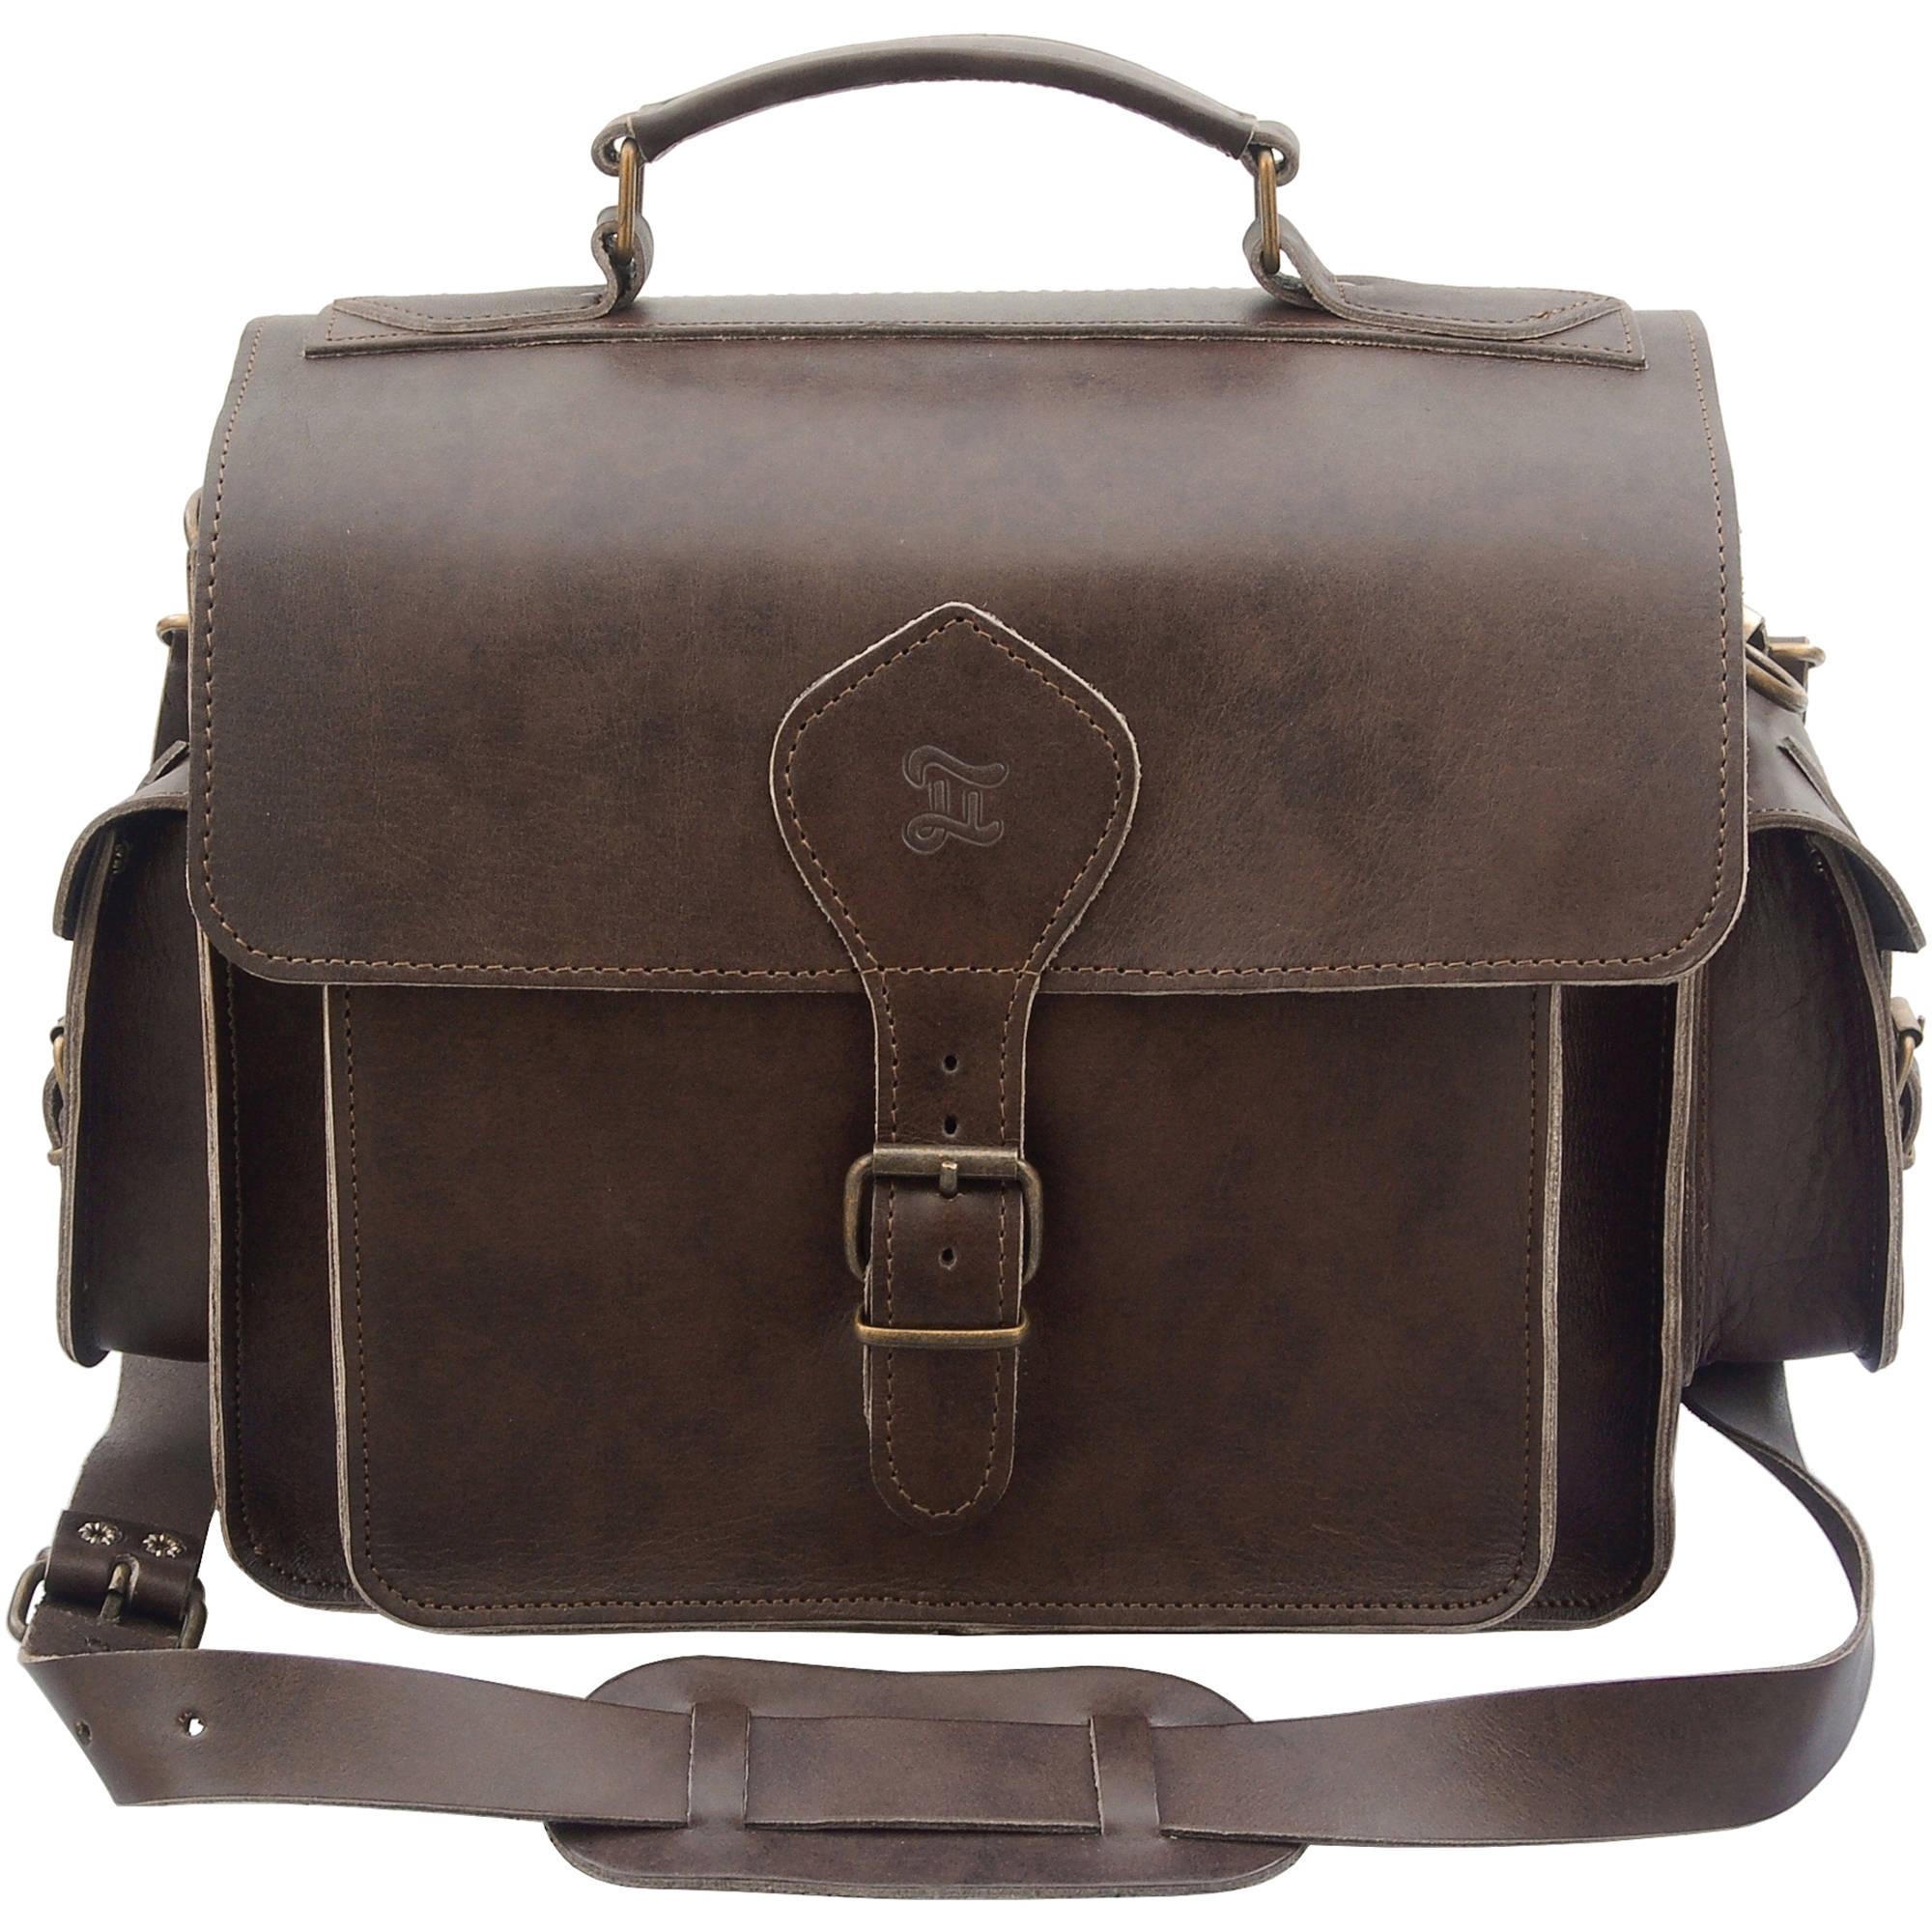 456f04772e Grafea England Leather Camera Photo Bag GRFPHOBRN-55 B H Photo